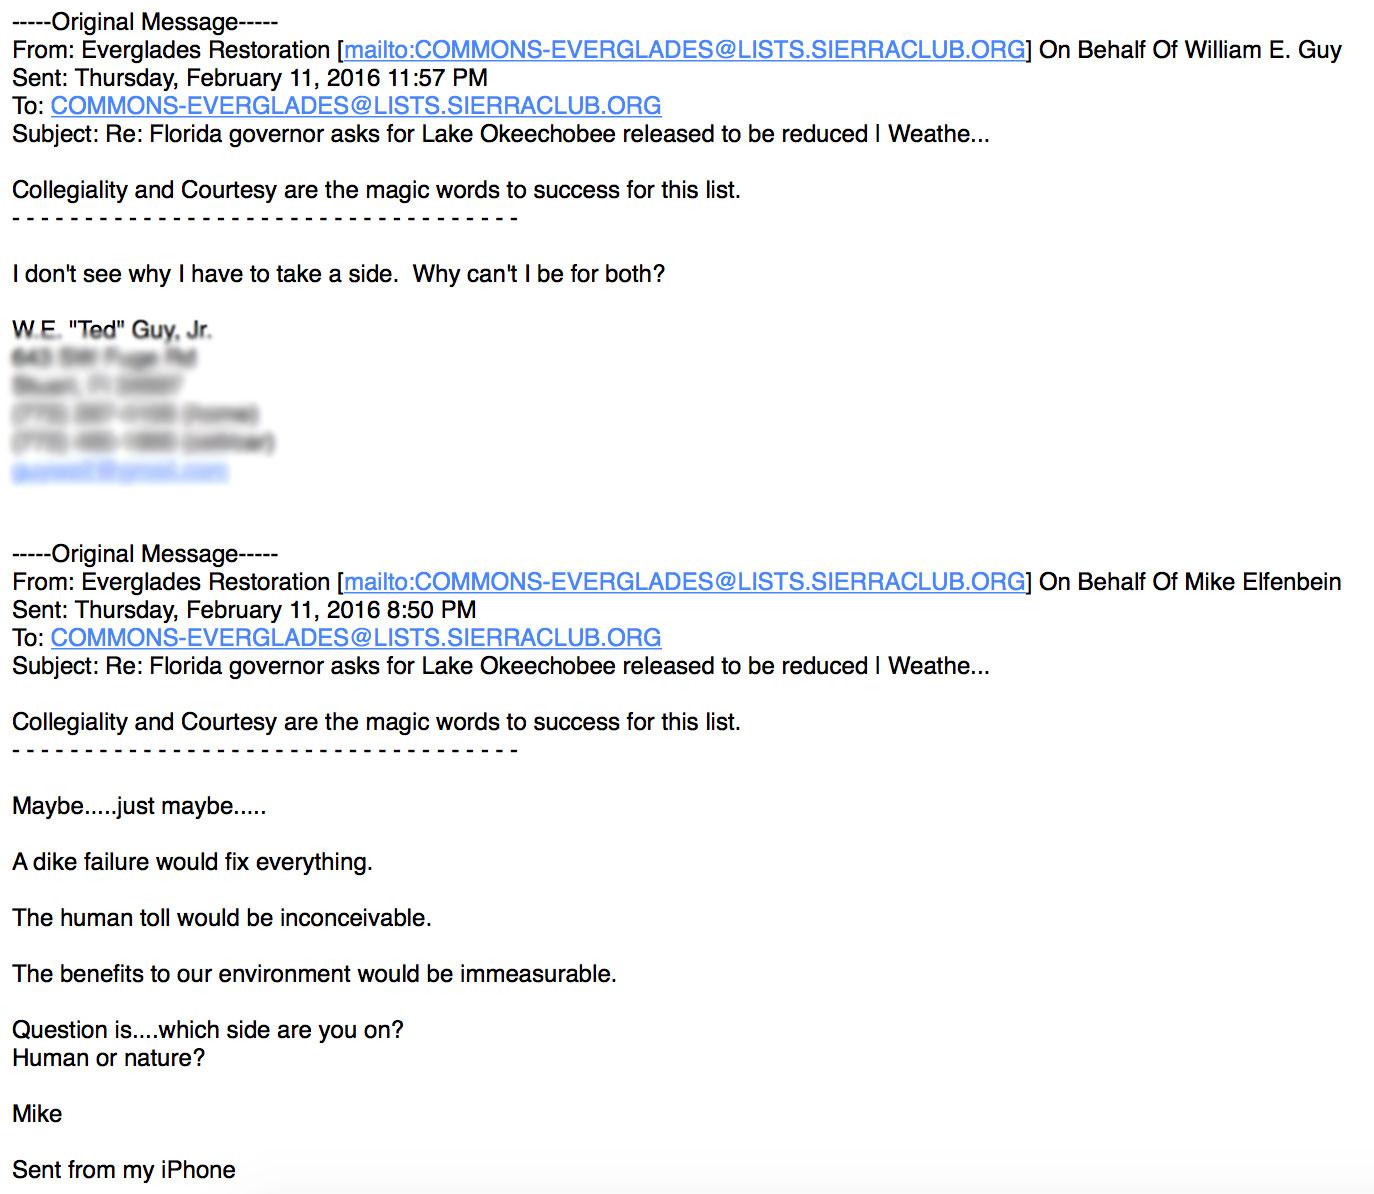 environmental email exchange